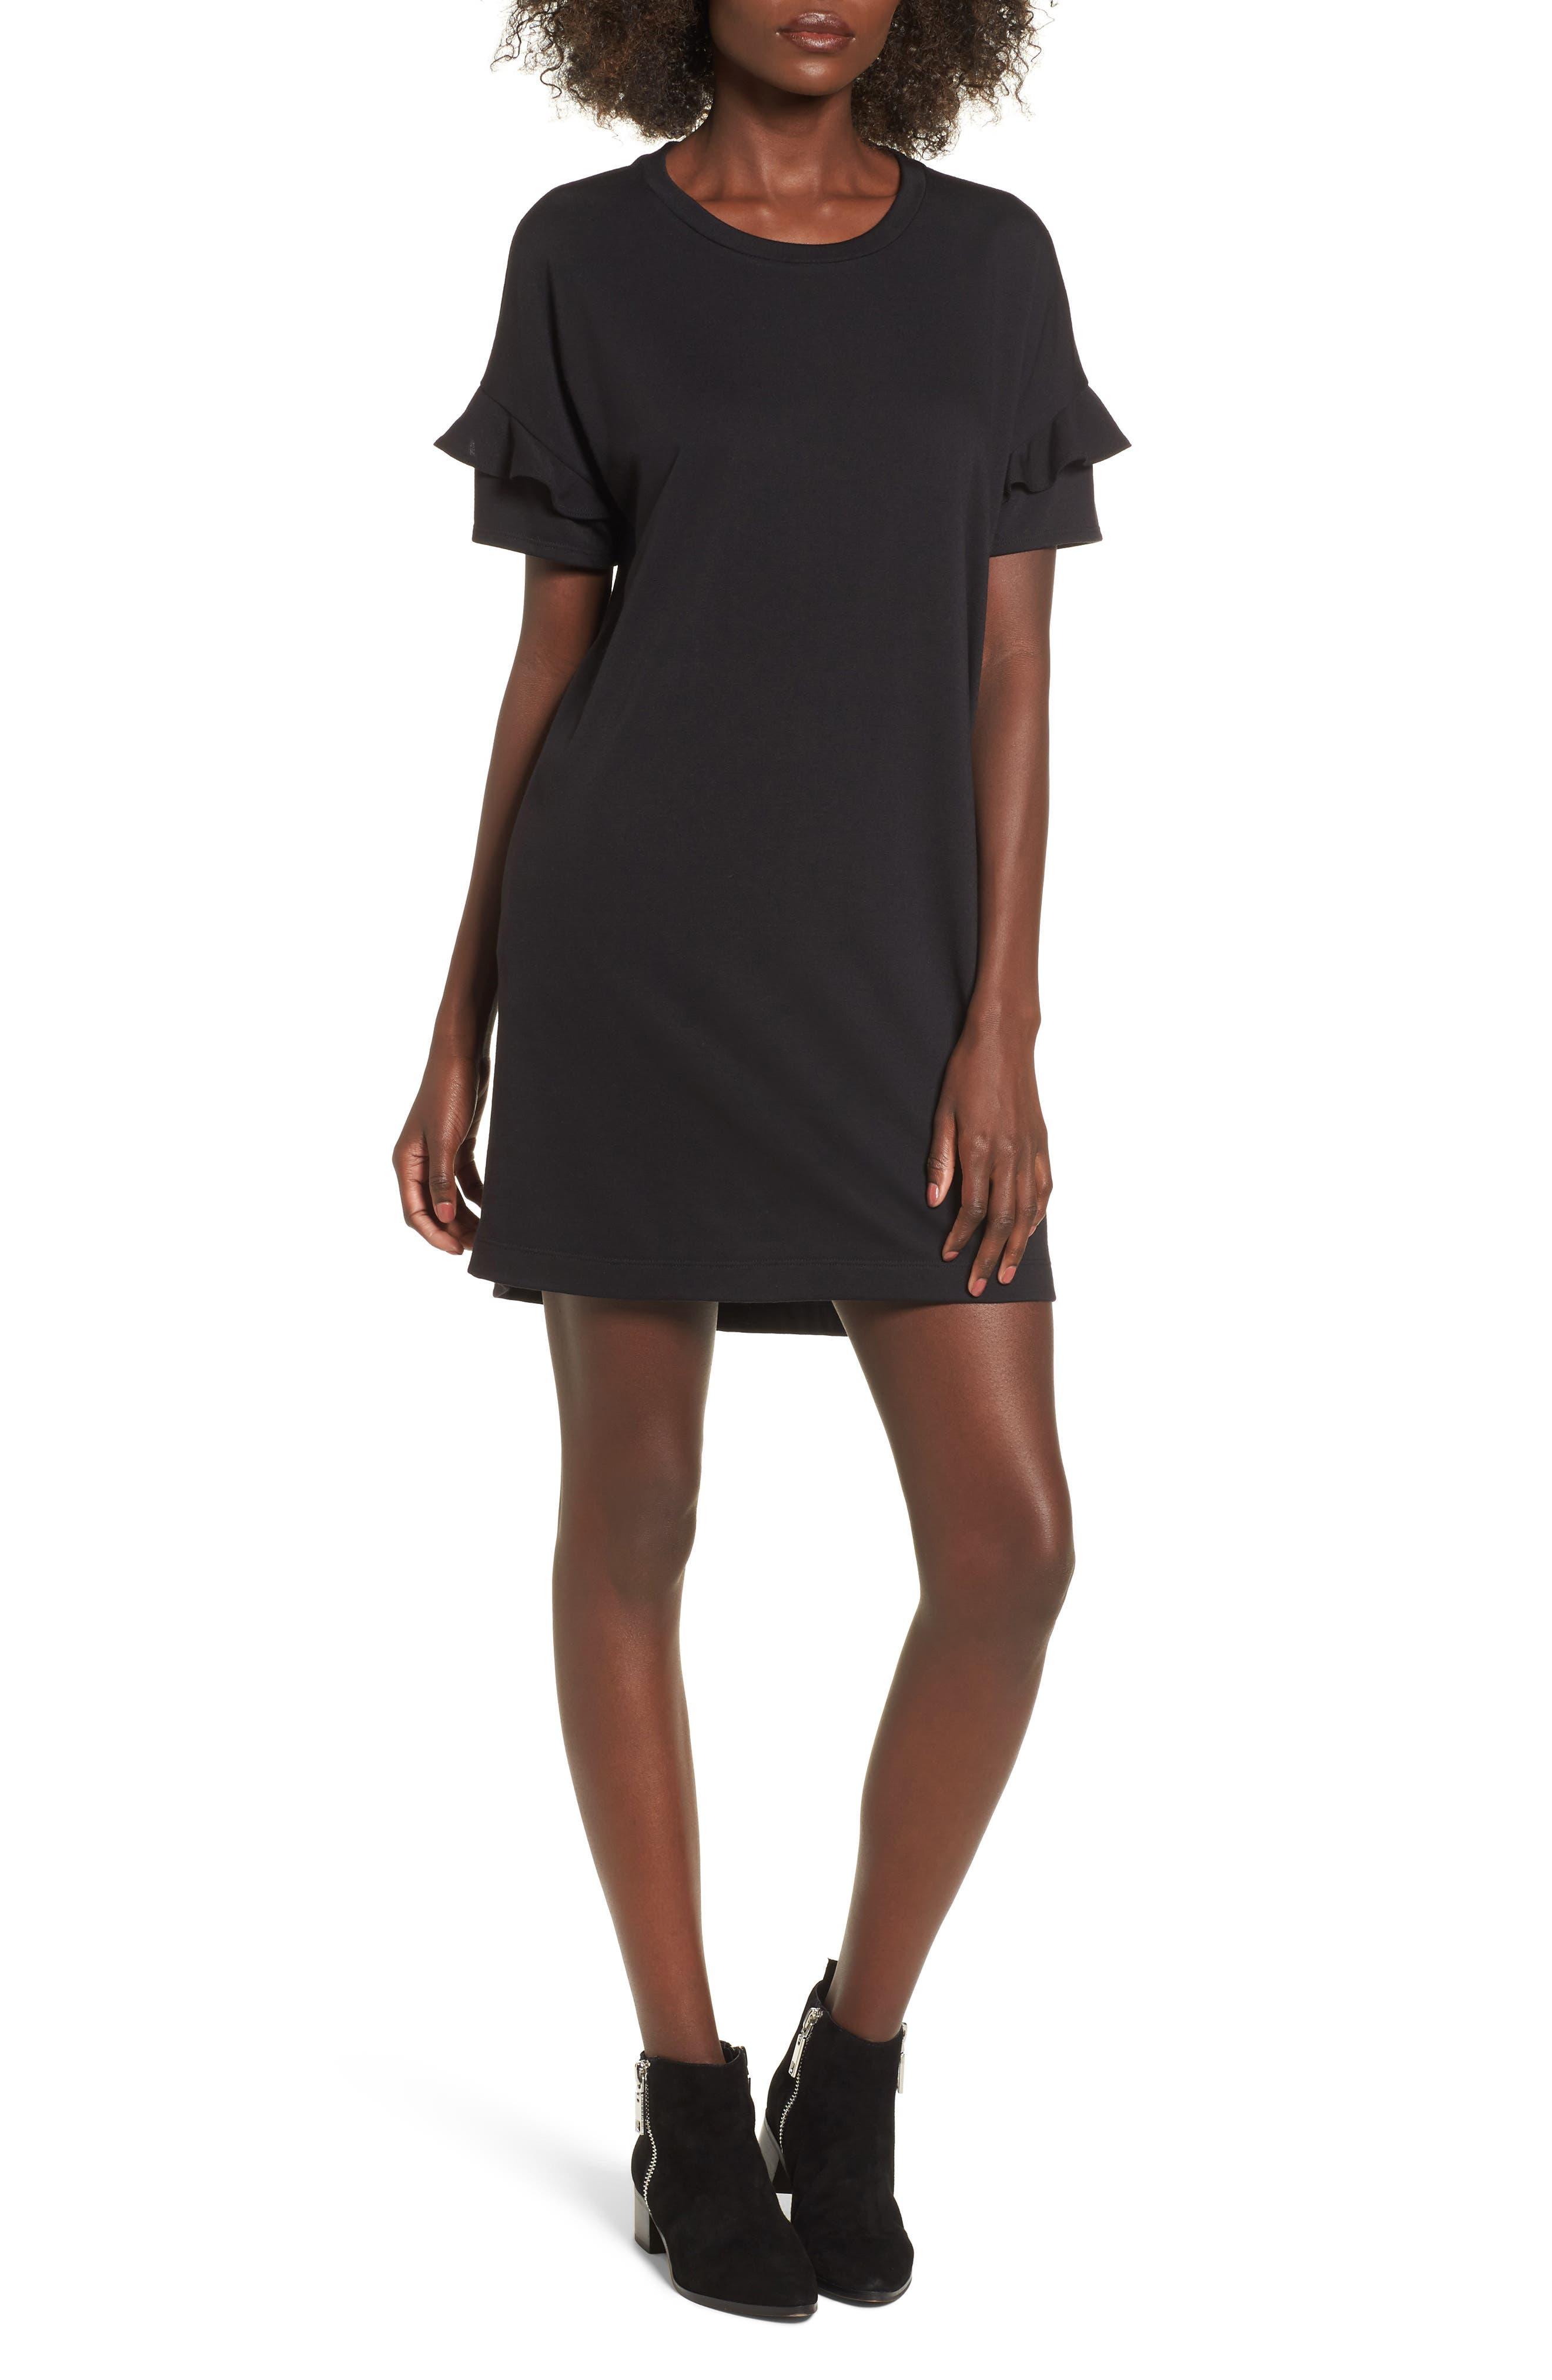 ---, Ruffle Sleeve T-Shirt Dress, Main thumbnail 1, color, 001